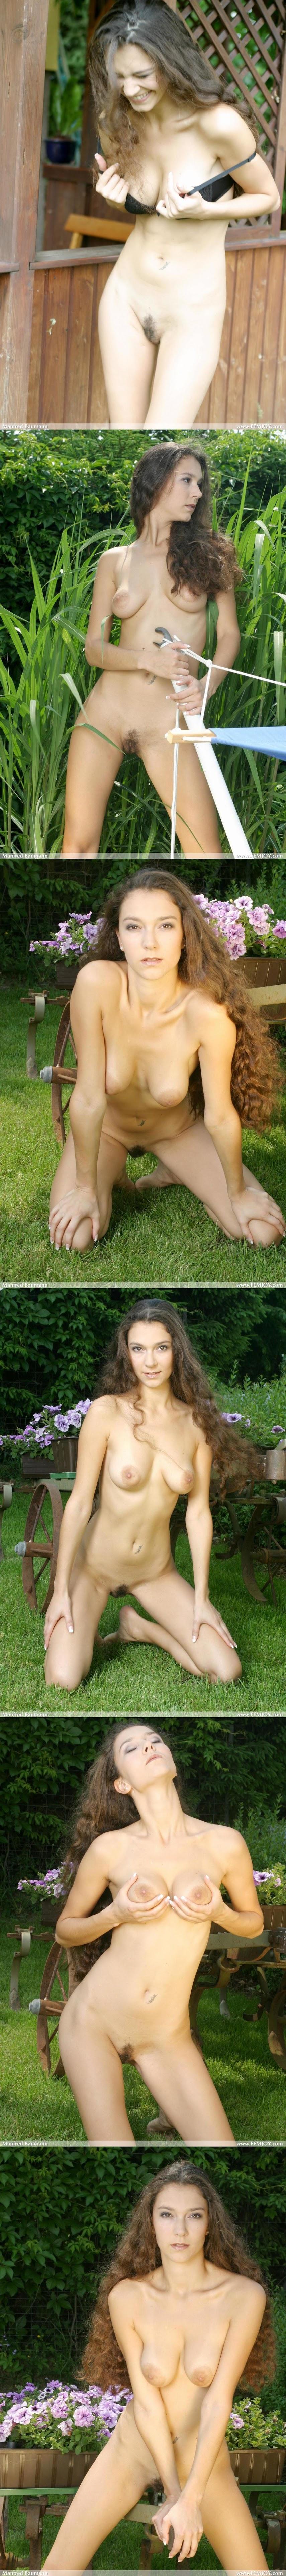 FEdf__-_2004-08-30_-_Elenia_-_Secret_Garden_II_x30_2000px.zip-jk- FEdf  - 2004-09-06 - Angeline - Natural x18 3000px